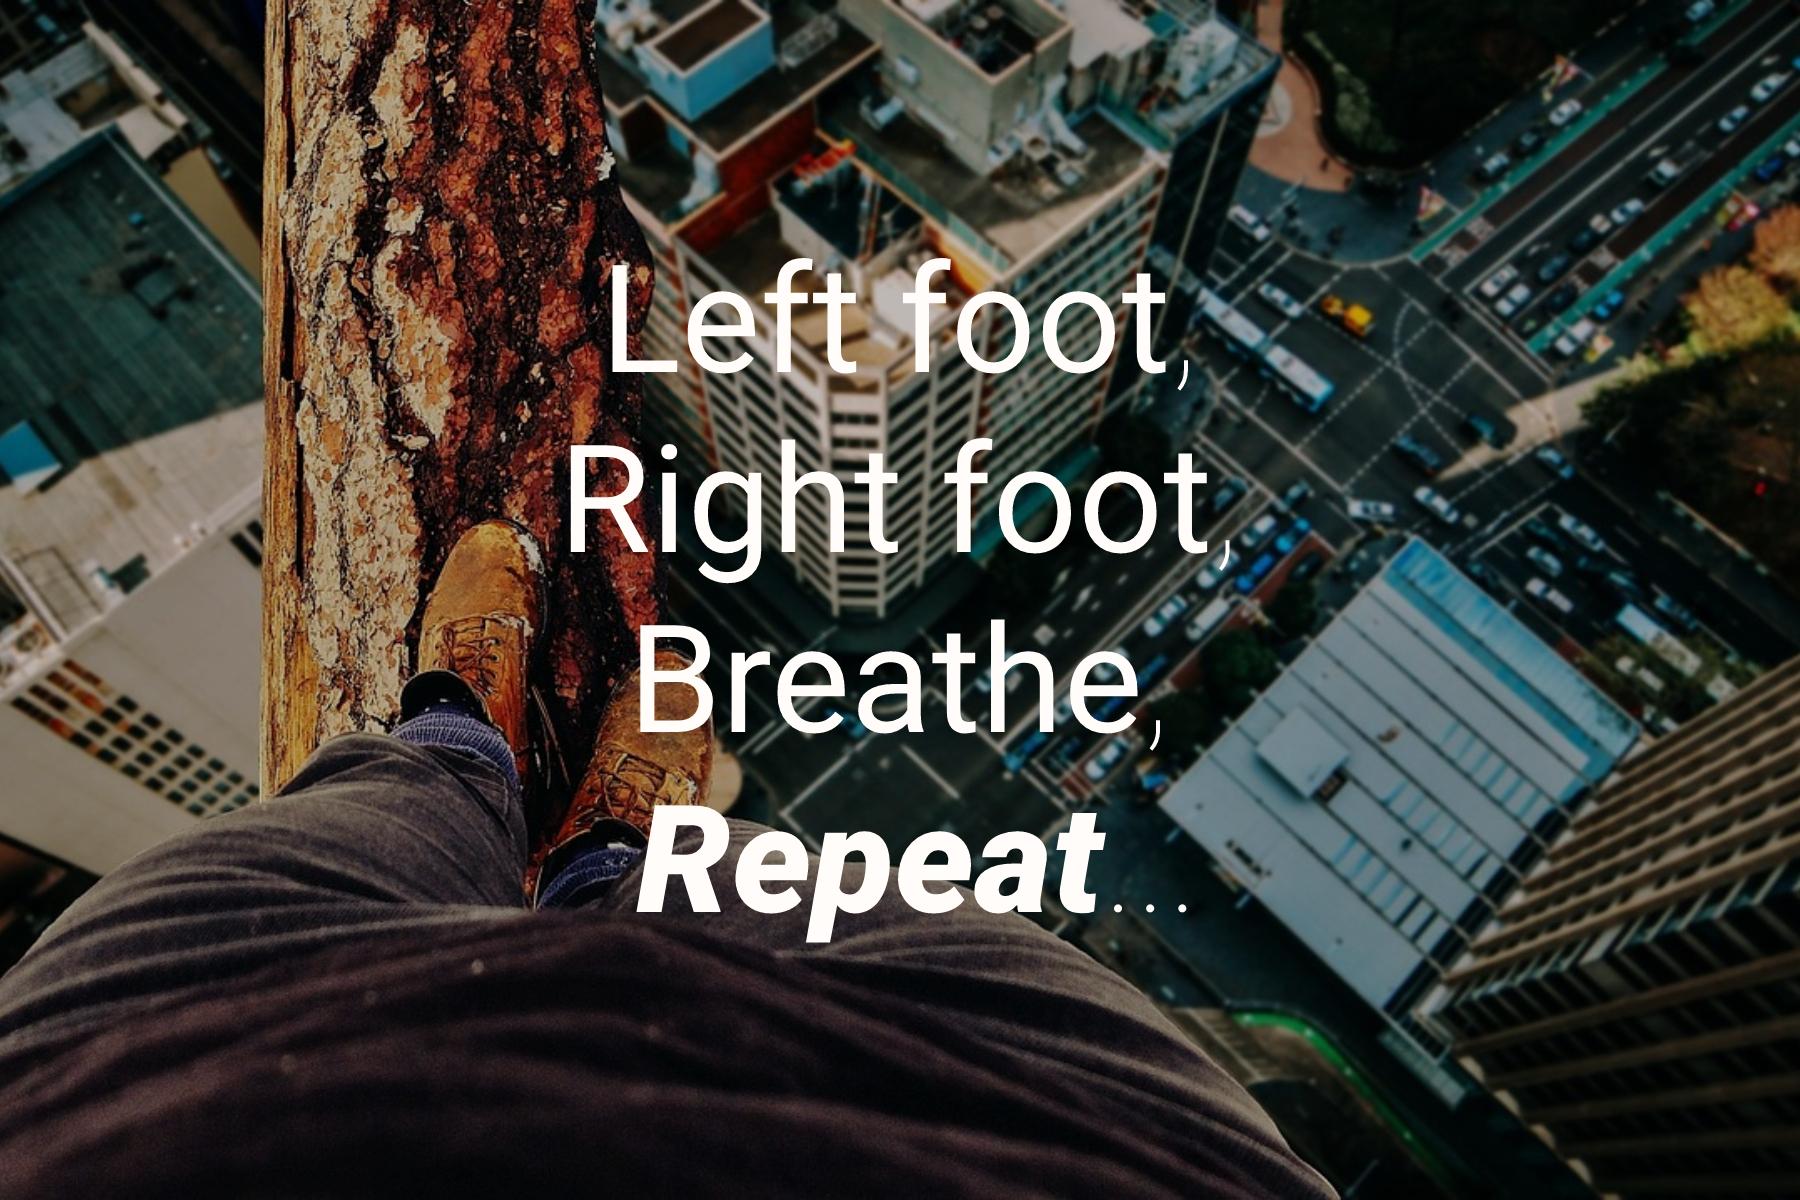 Breathe Repeat